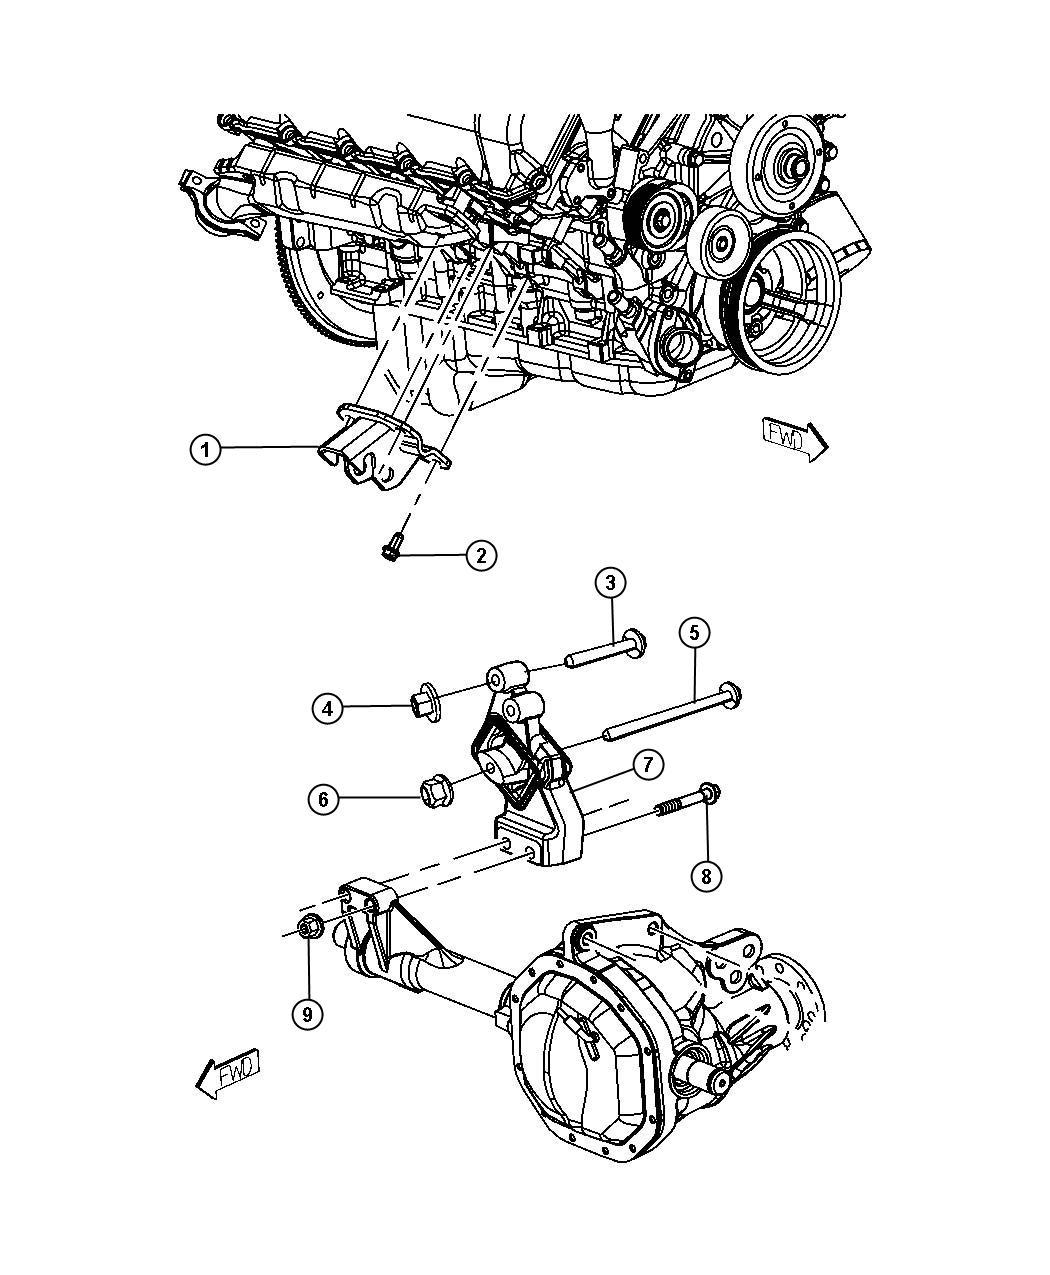 2008 Dodge Ram 1500 Insulator. Engine mount. Mounting